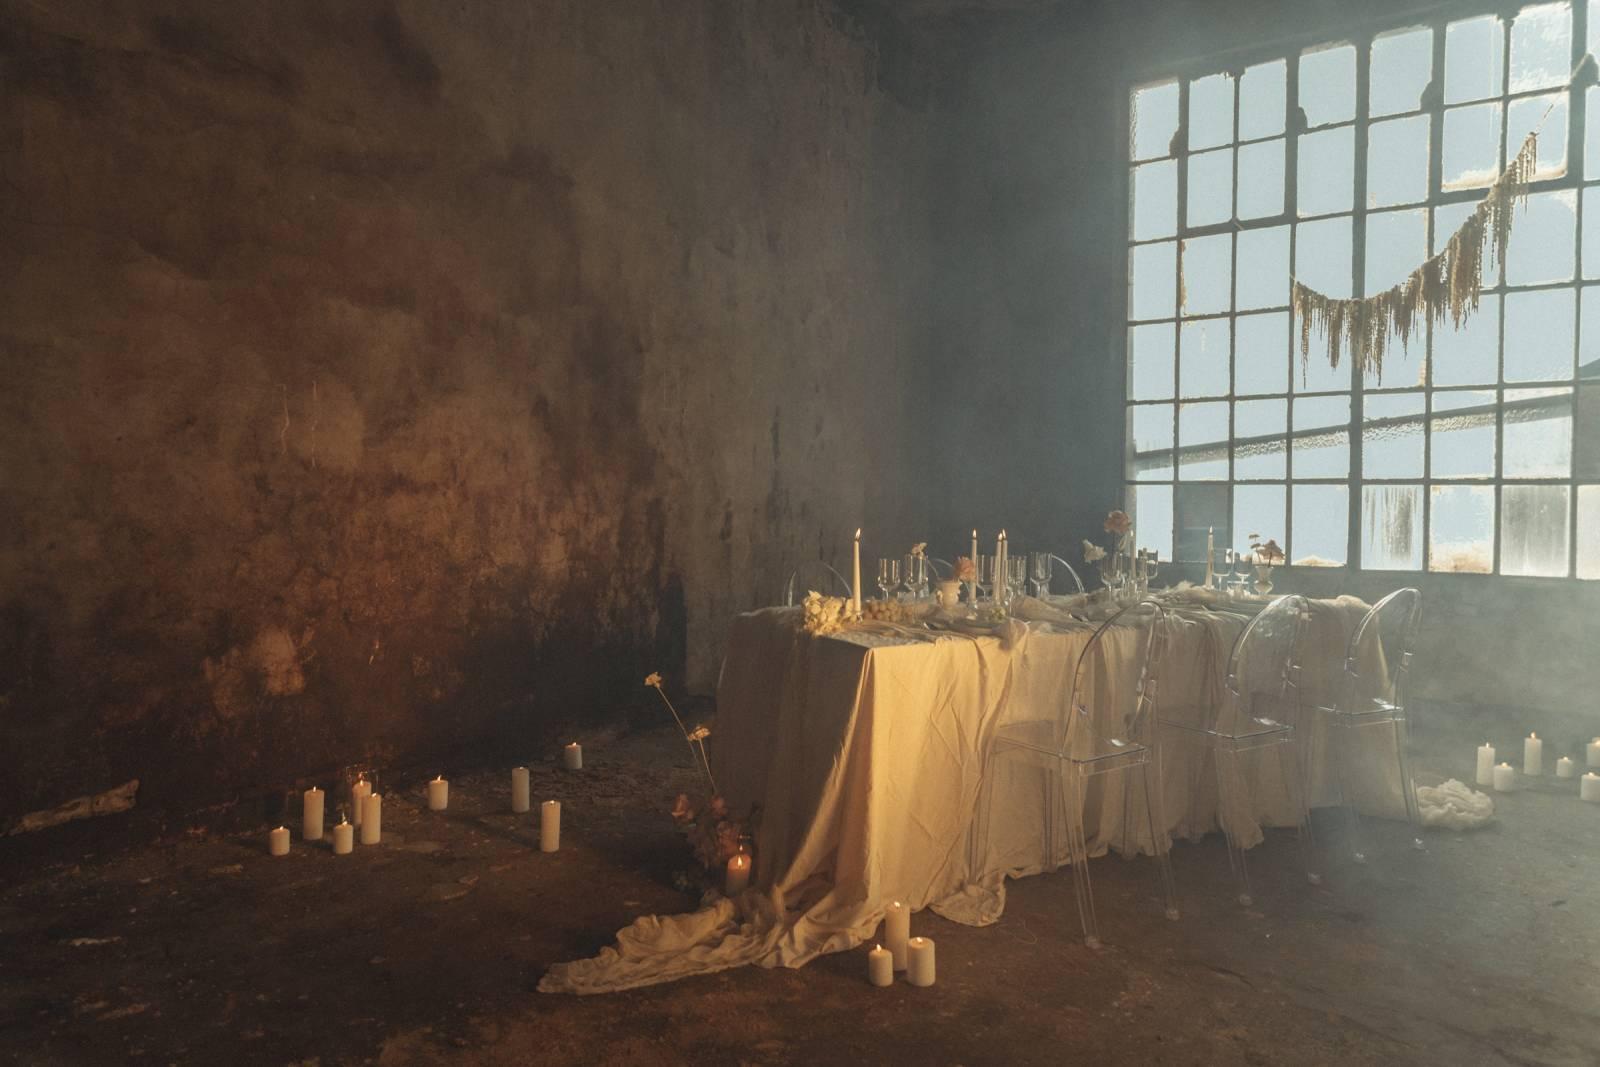 Elien Jansen - Fotograaf - House Of Weddings - 5